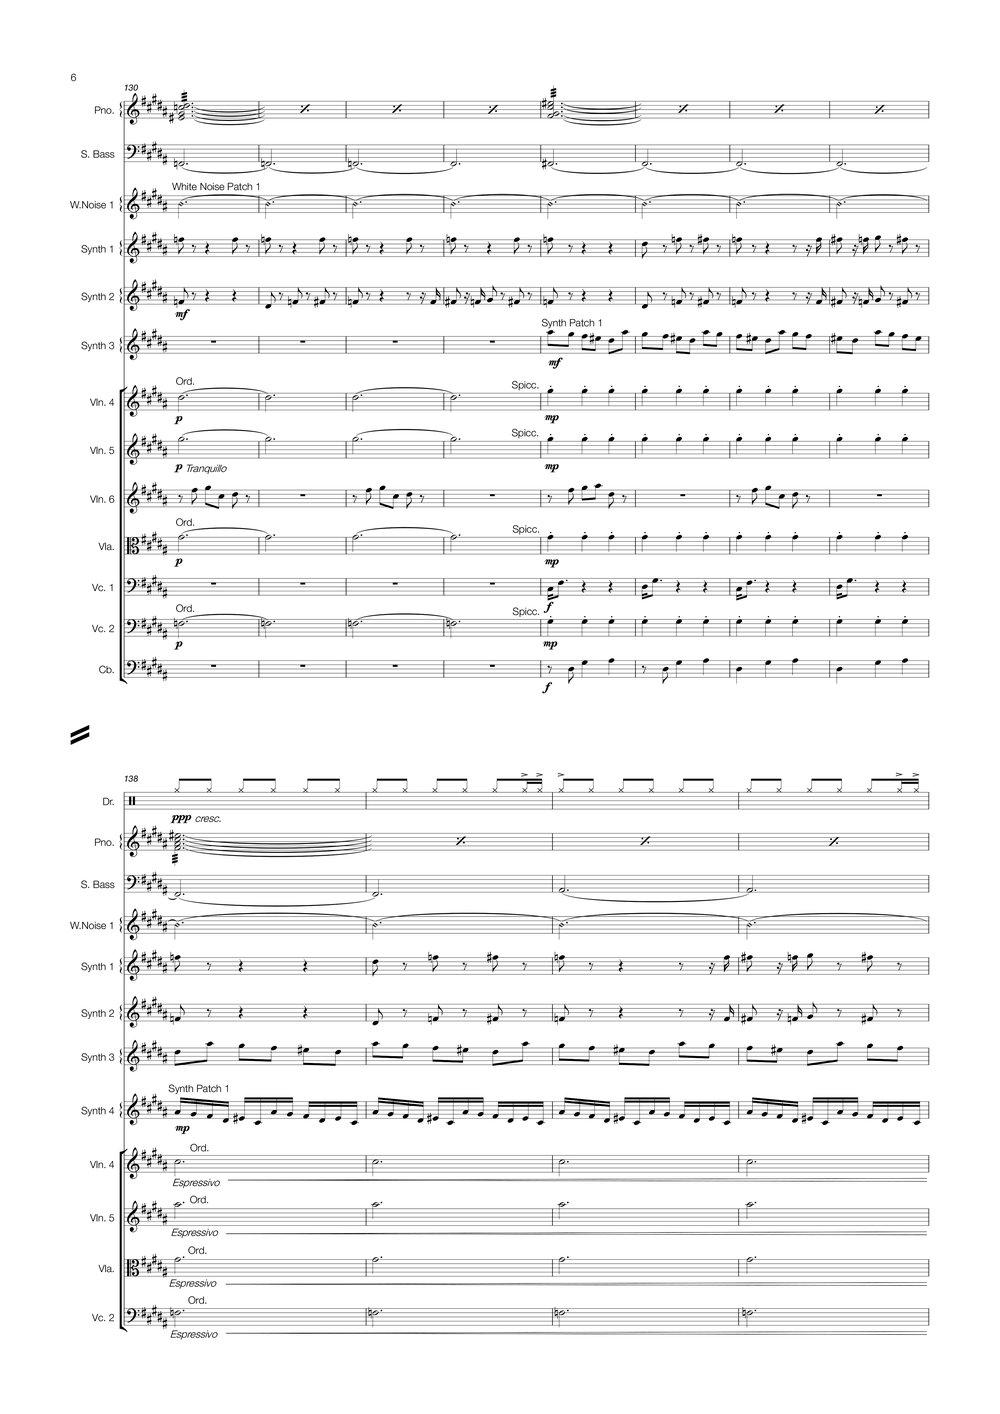 Elliptically Elliptical Score Page 8.jpg